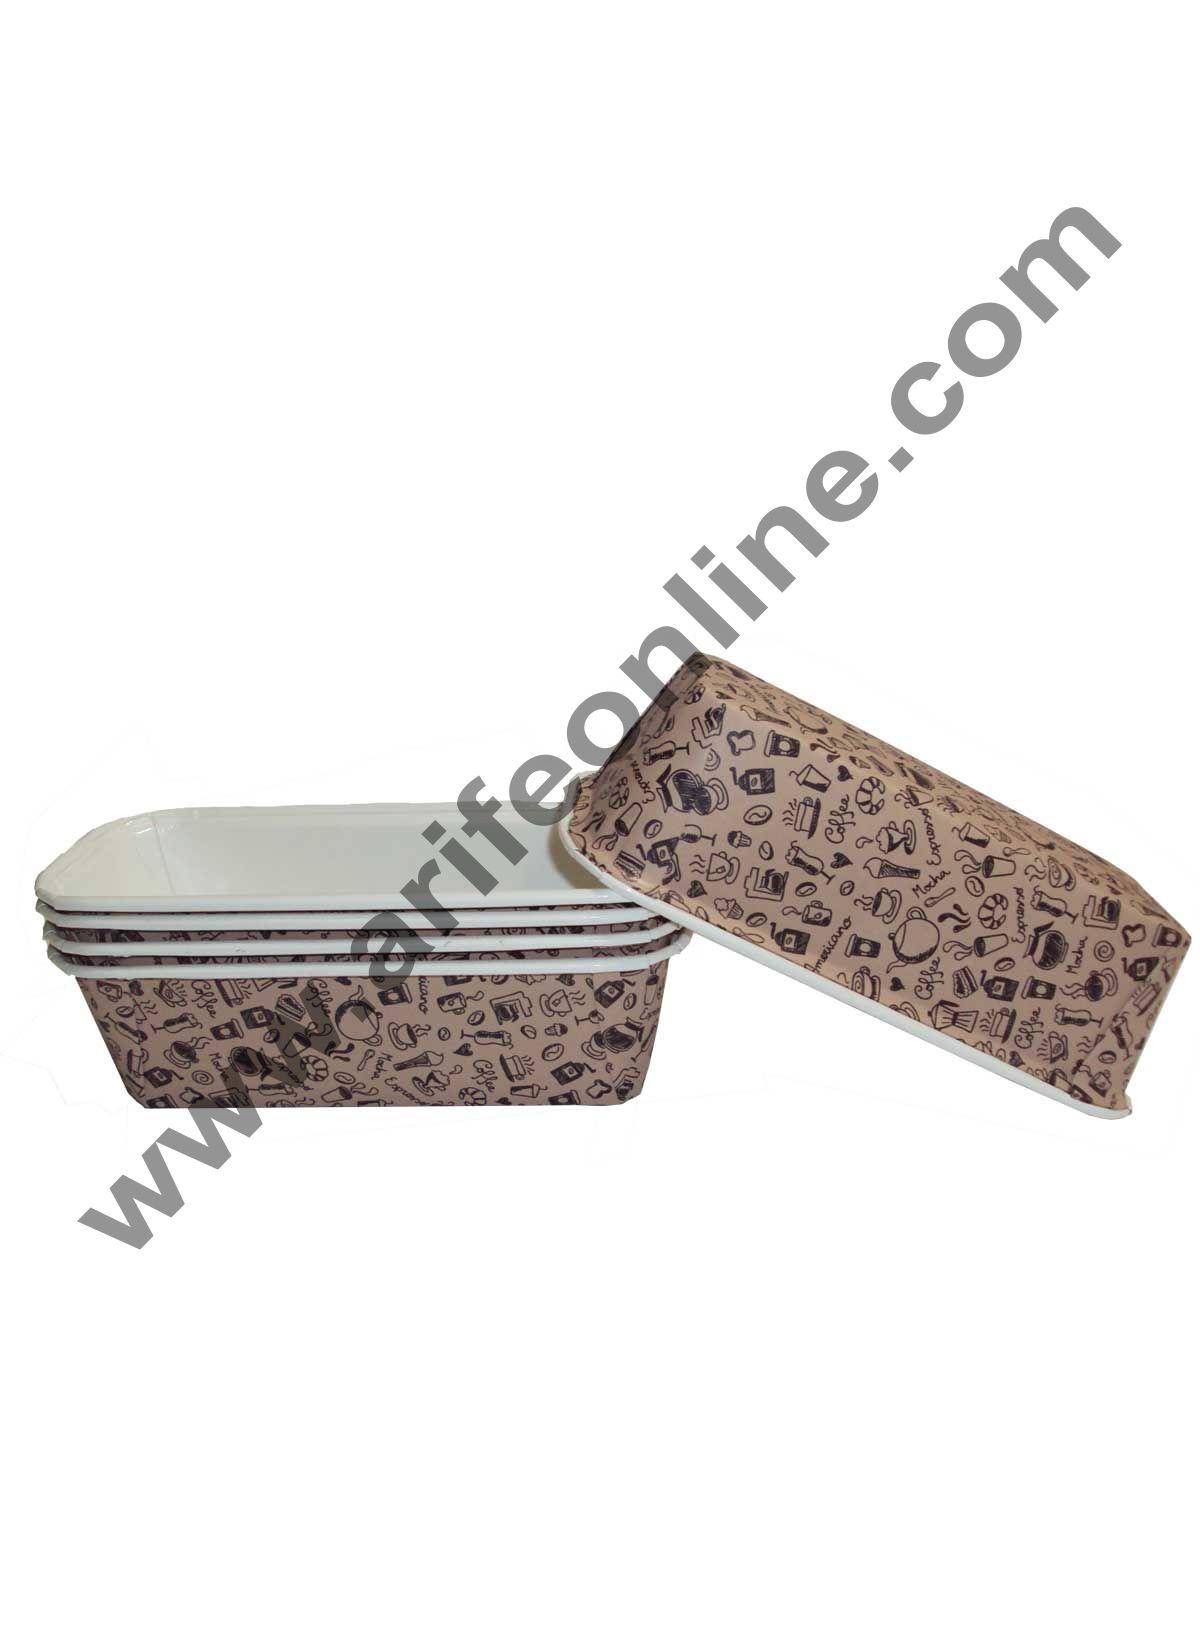 Novacart Bake & Serve Paper Baking Mould By Cake Decor - Plum Cake Mould Brown 10 Pcs